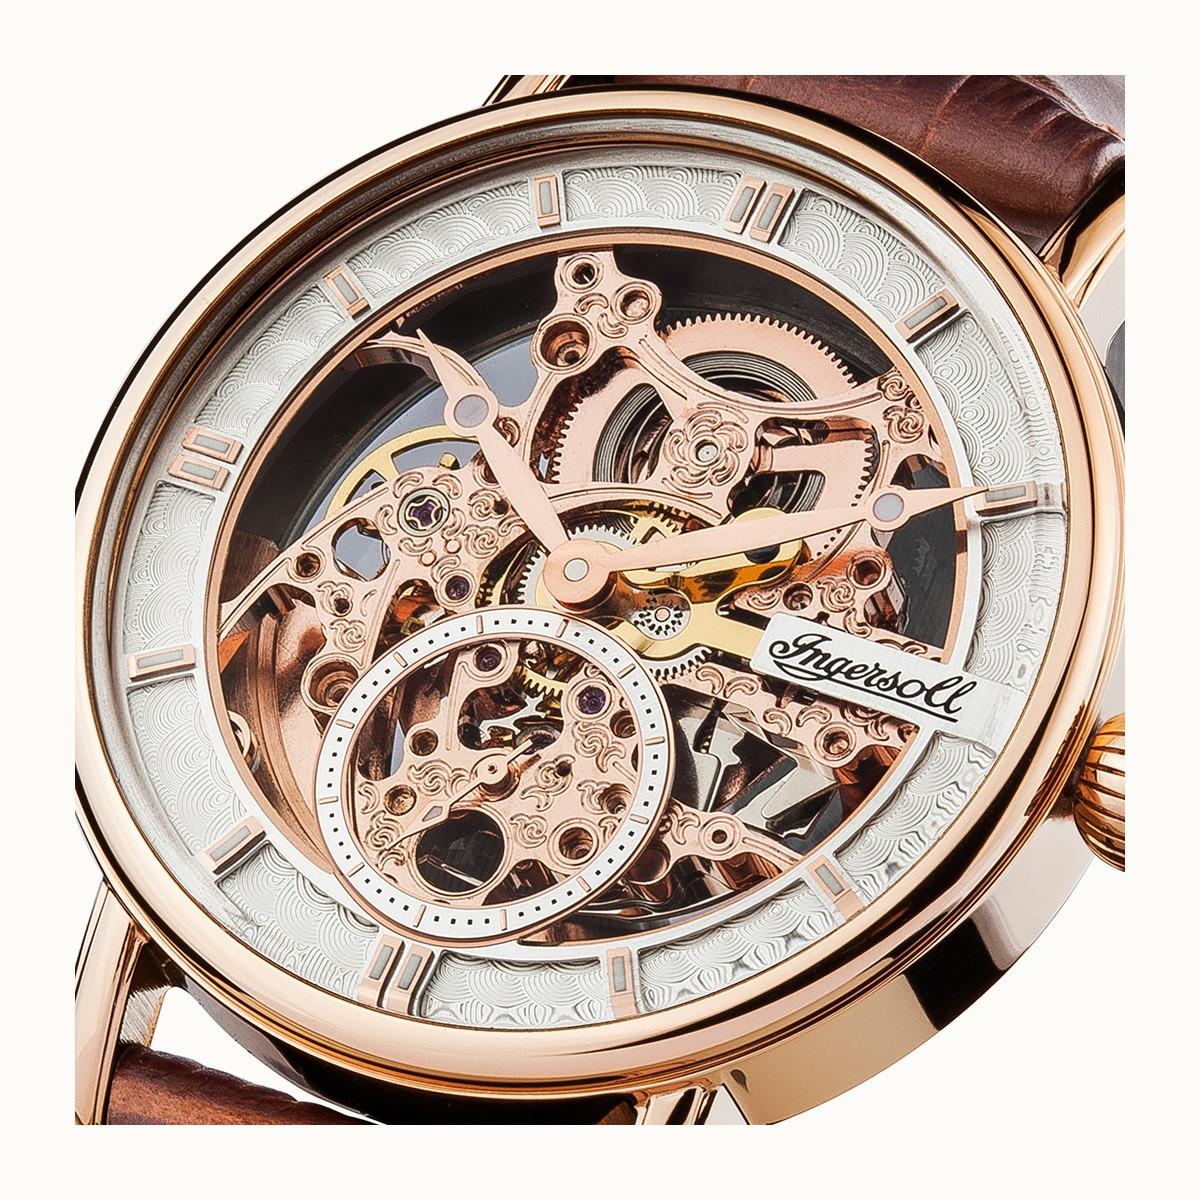 3c7603e50 Ingersoll THE HERALD AUTOMATIC I00401 – pohanka&co. – hodinky a klenoty